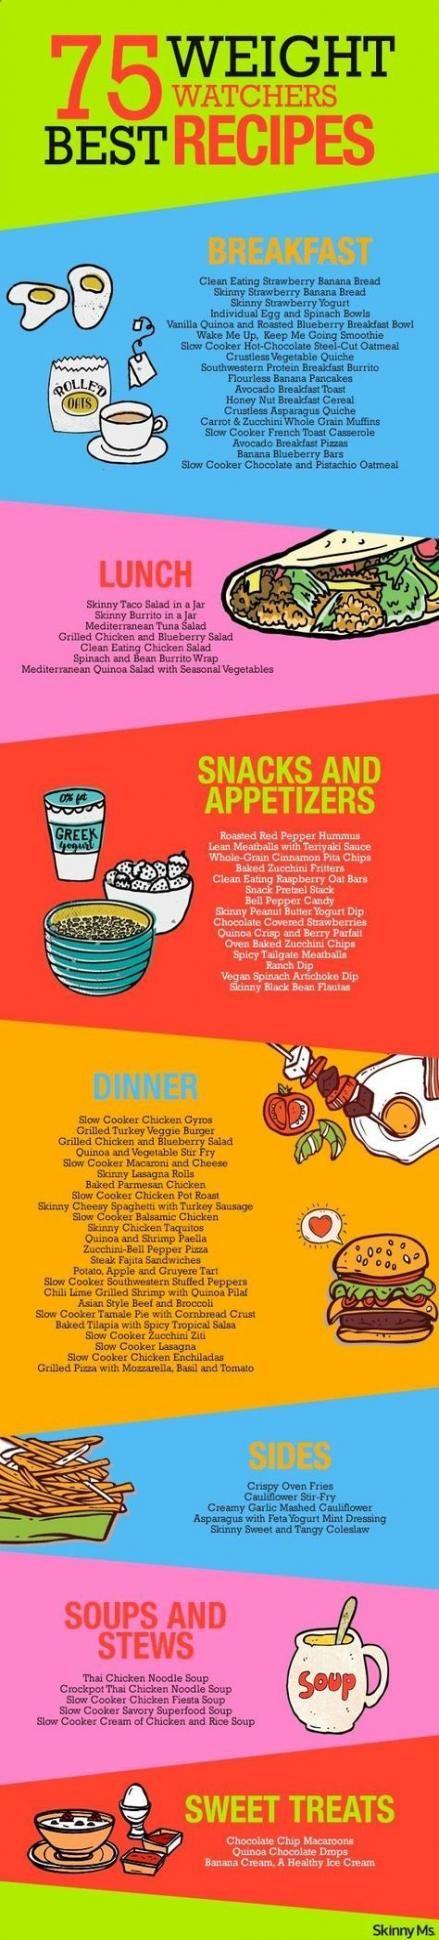 67+  Ideas diet recipes vegetarian losing weight #diet #recipes